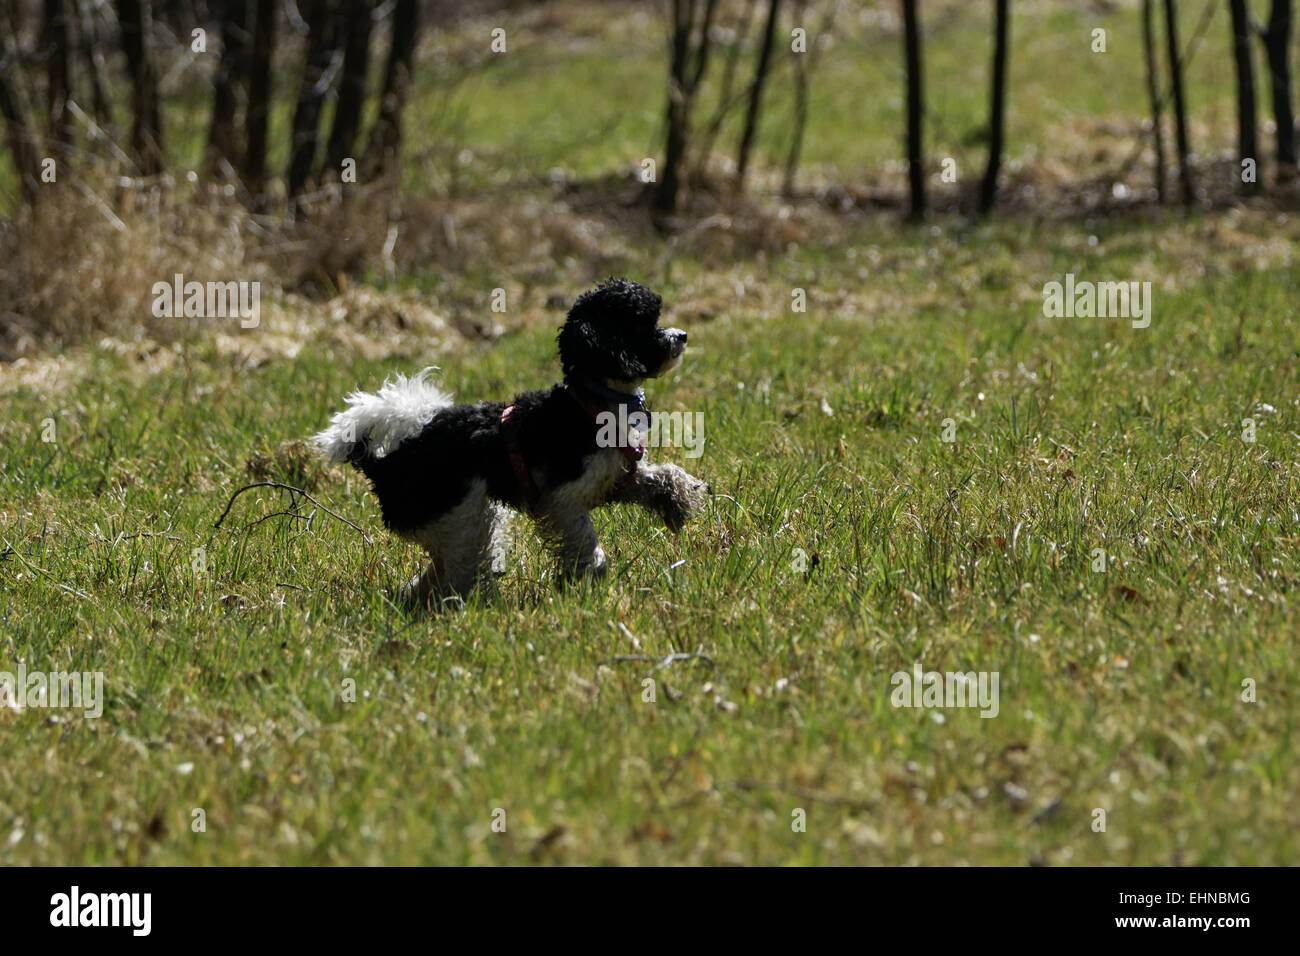 Playing poodles, Harlequin poodles - Stock Image